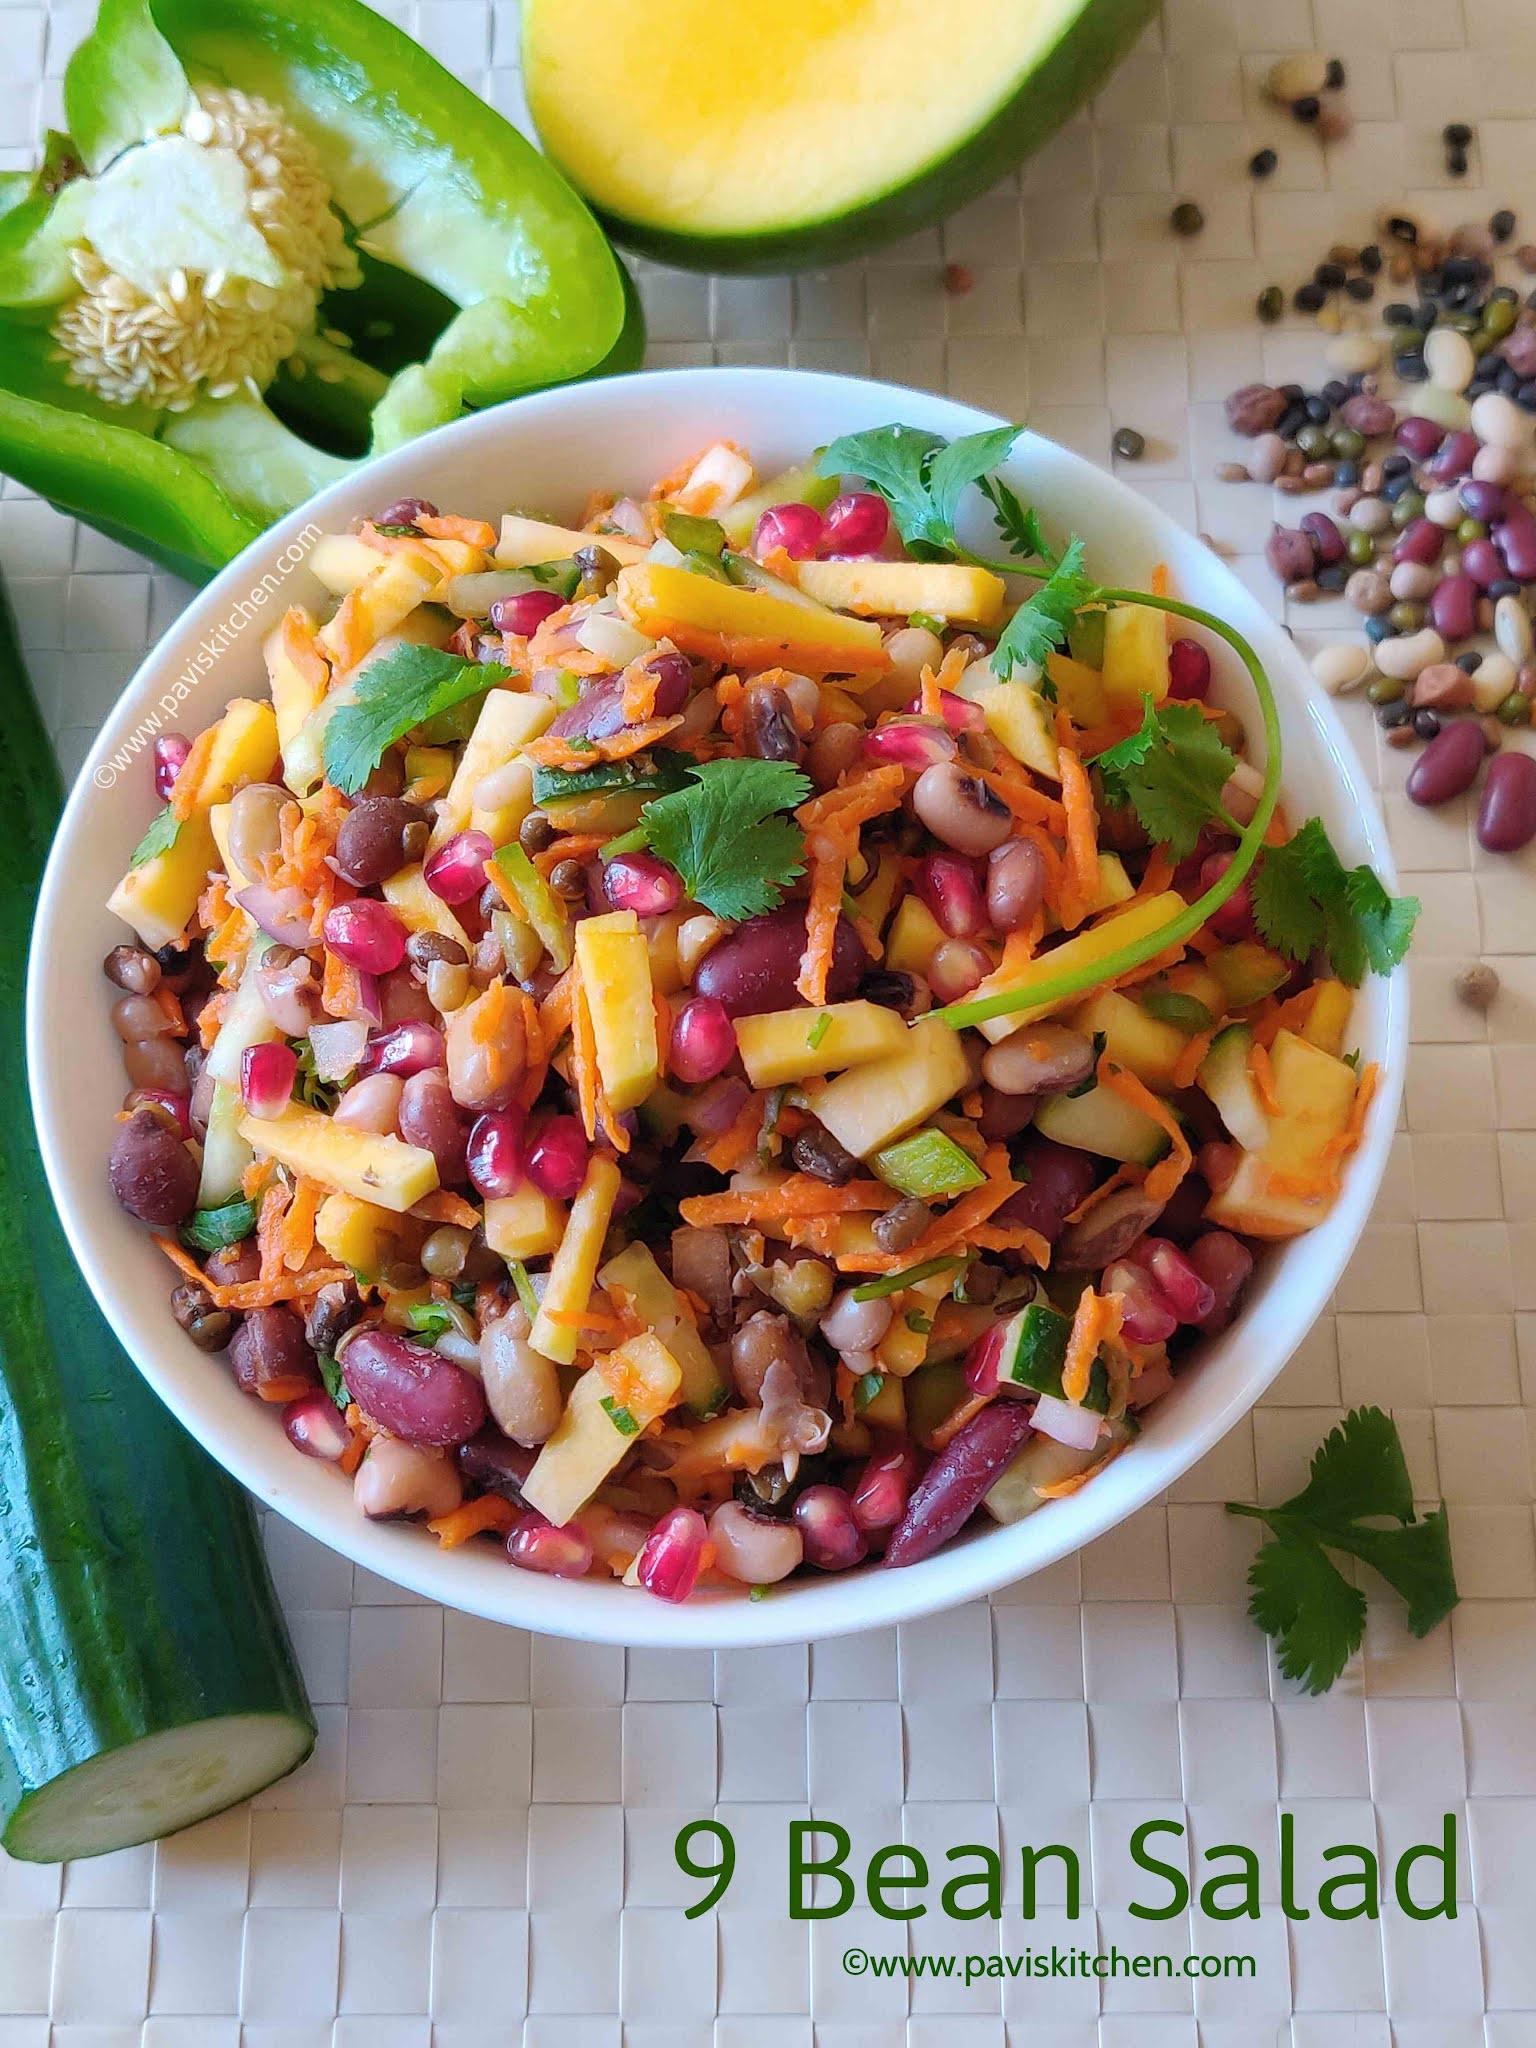 Mixed bean salad recipe   9 bean salad   bean chaat recipe   navadhanya salad